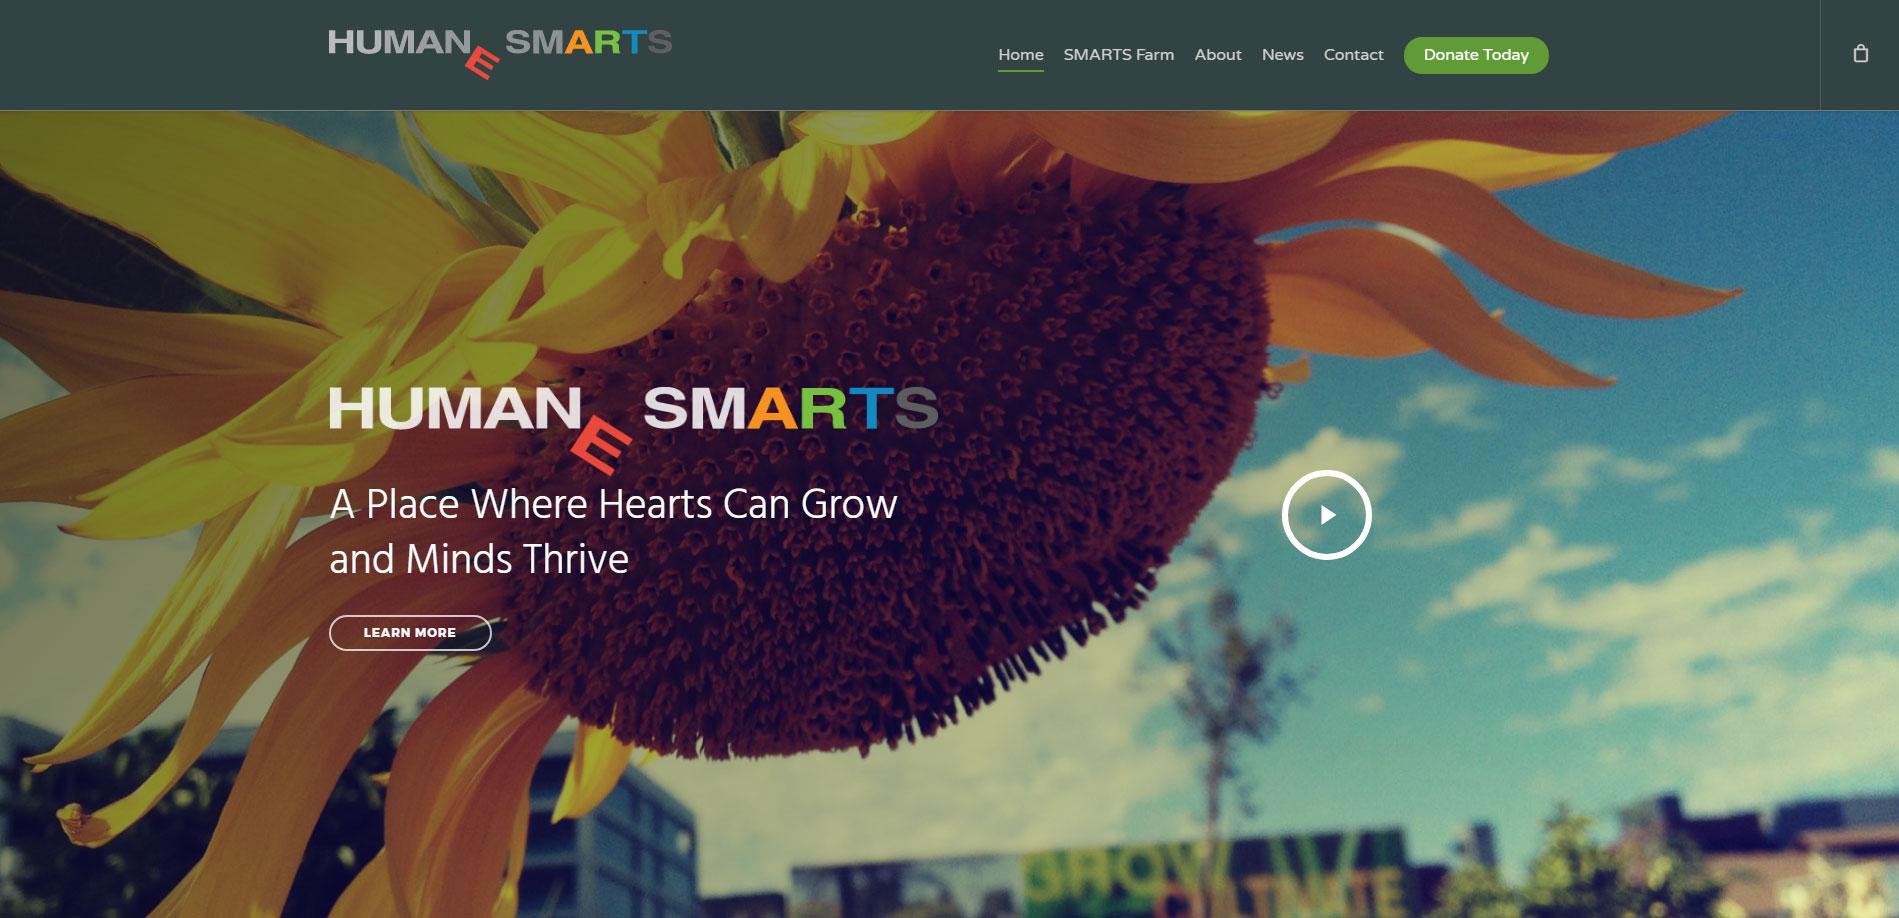 Humane Smarts Goes Live